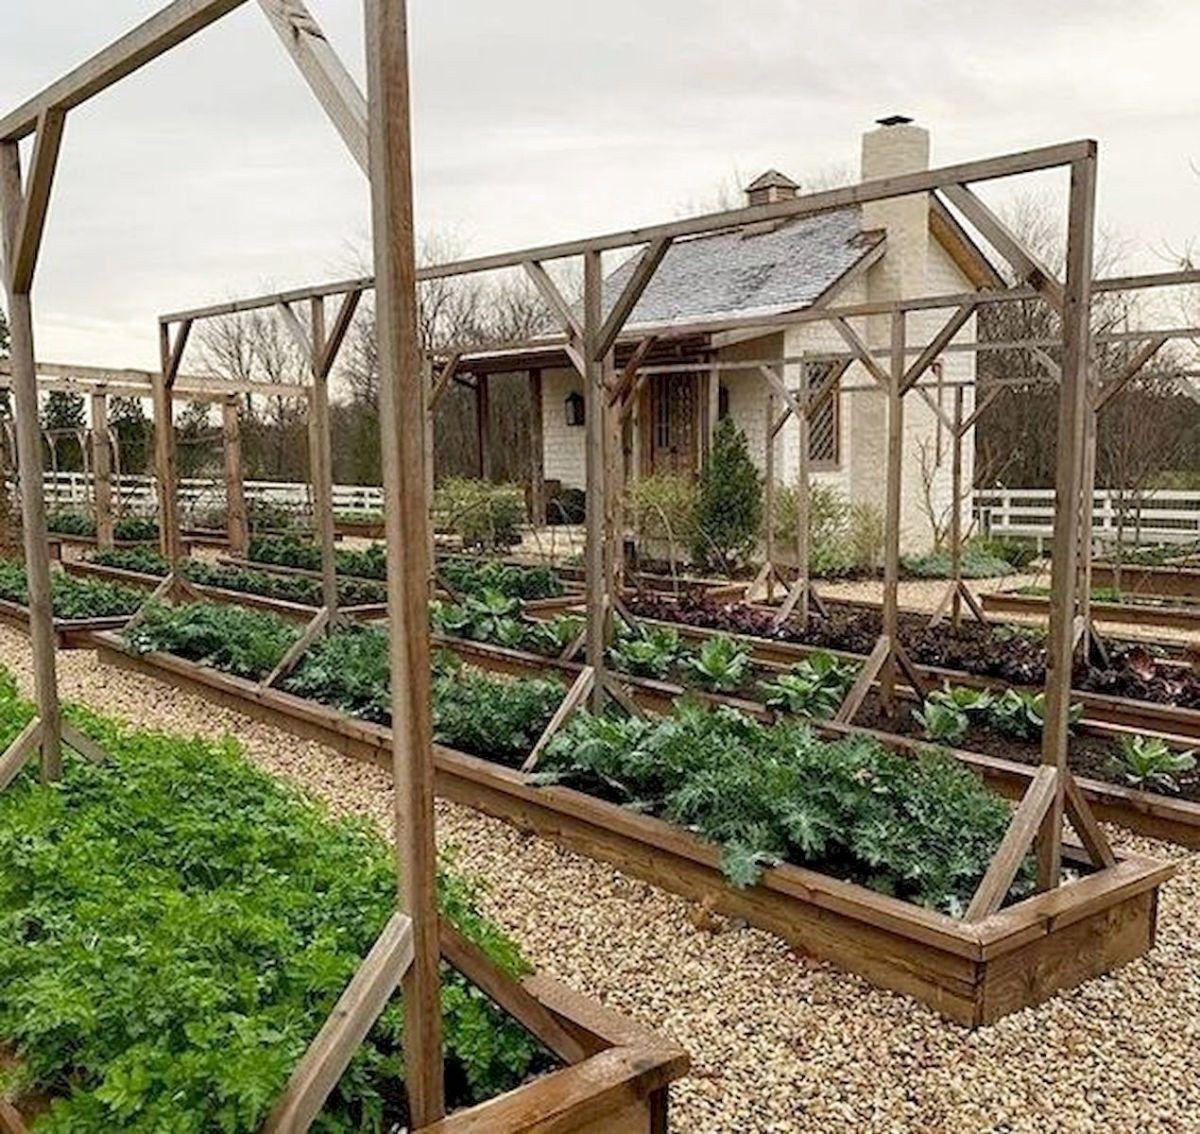 Design Ideas For Vegetable Gardens: 33 Excited Vegetables Garden Ideas